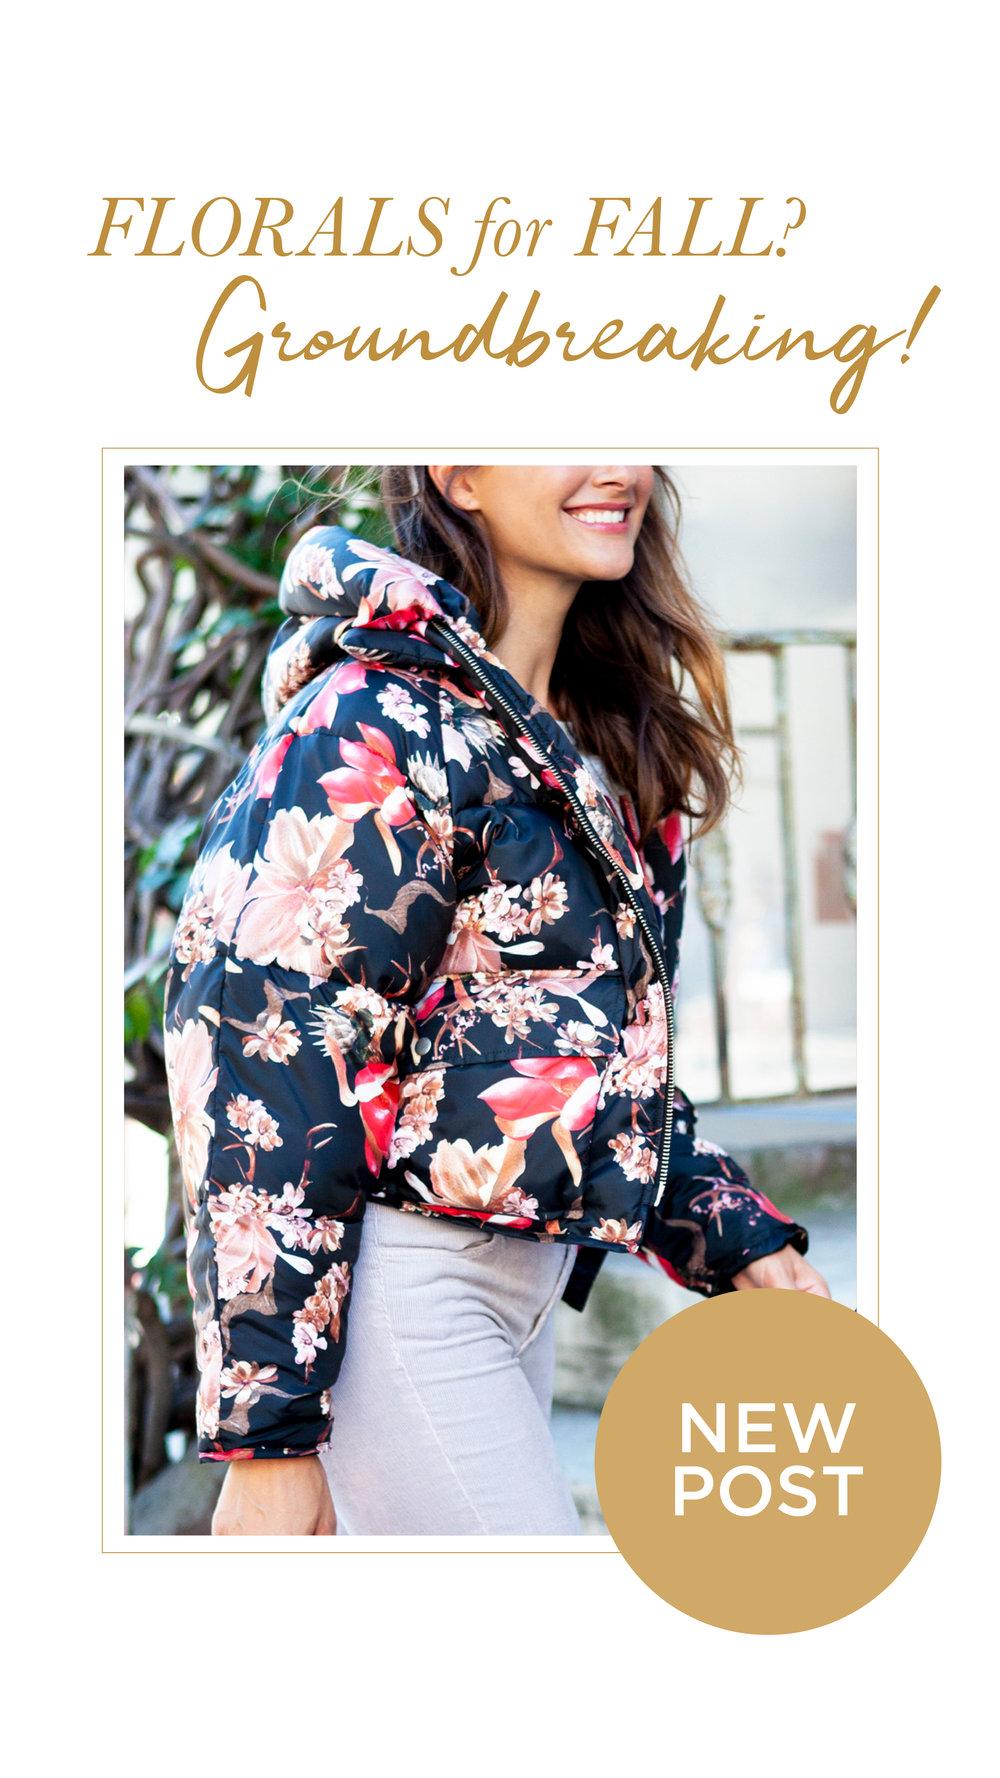 MARCUS_Social_MKT Floral Coat-01.jpg